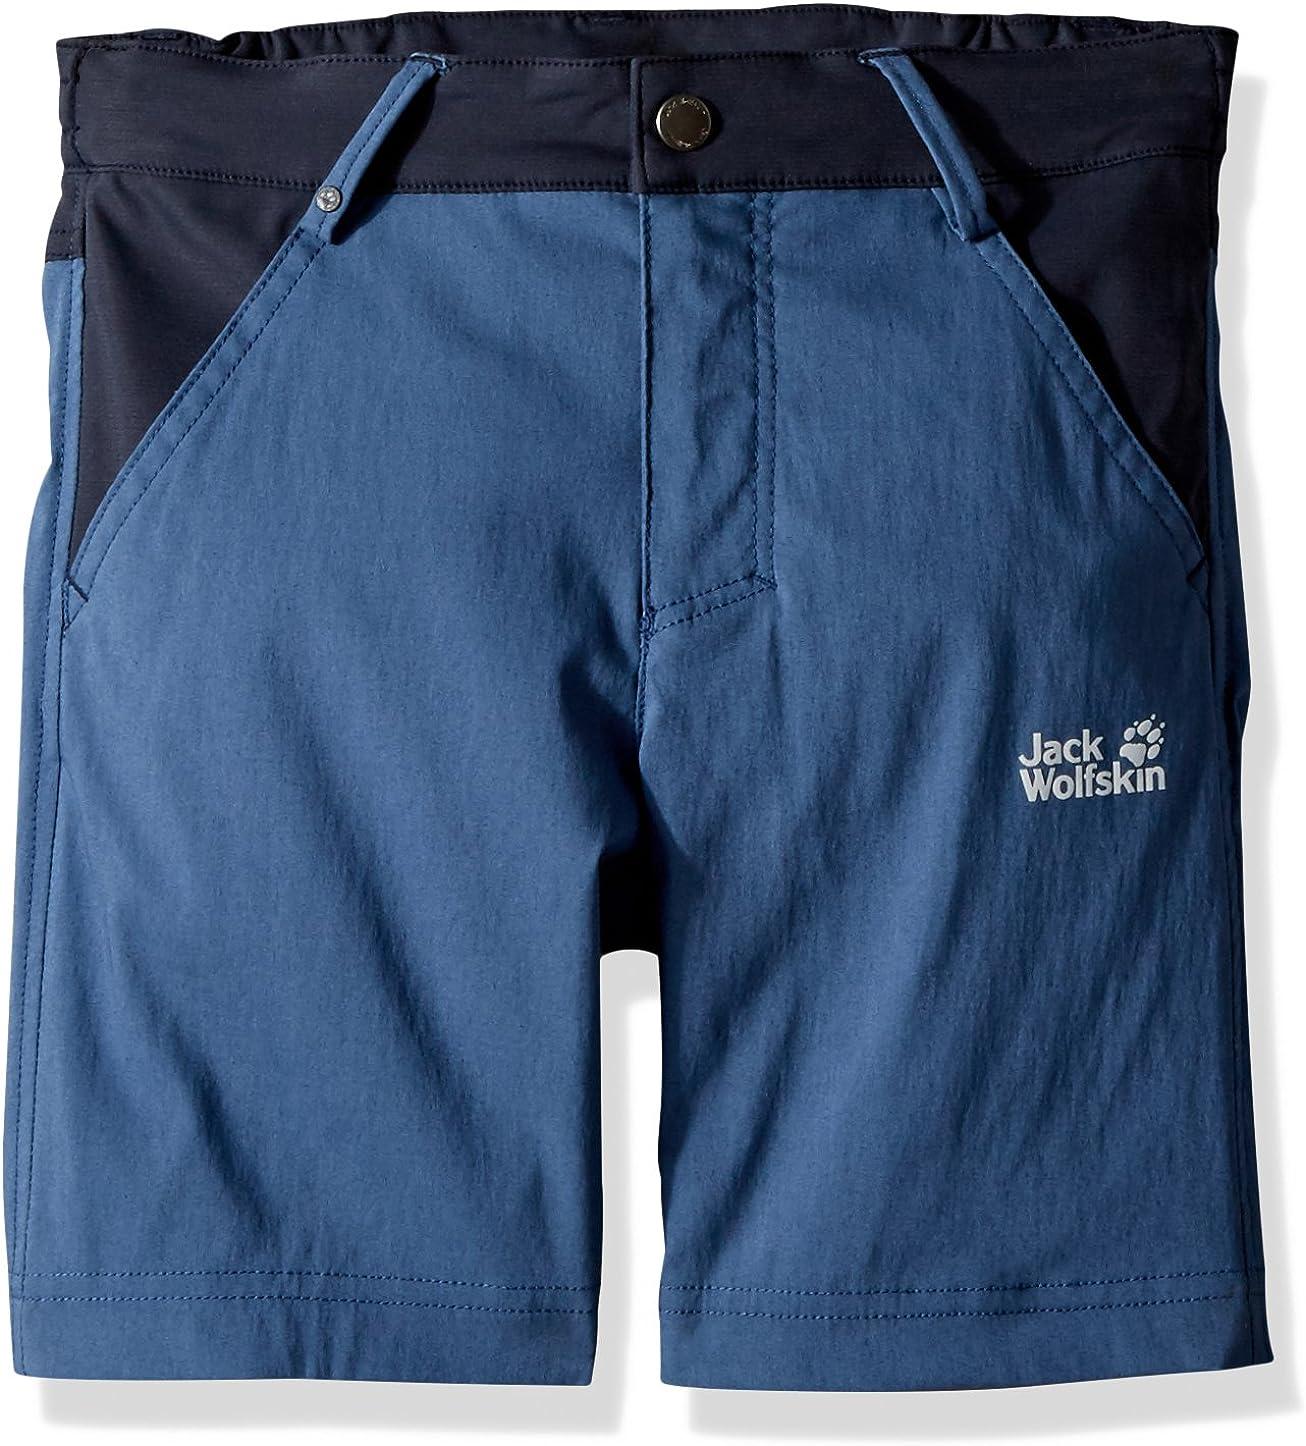 Jack Wolfskin Dillon flex Shorts, 140 (9-10 Years Old), Ocean Wave